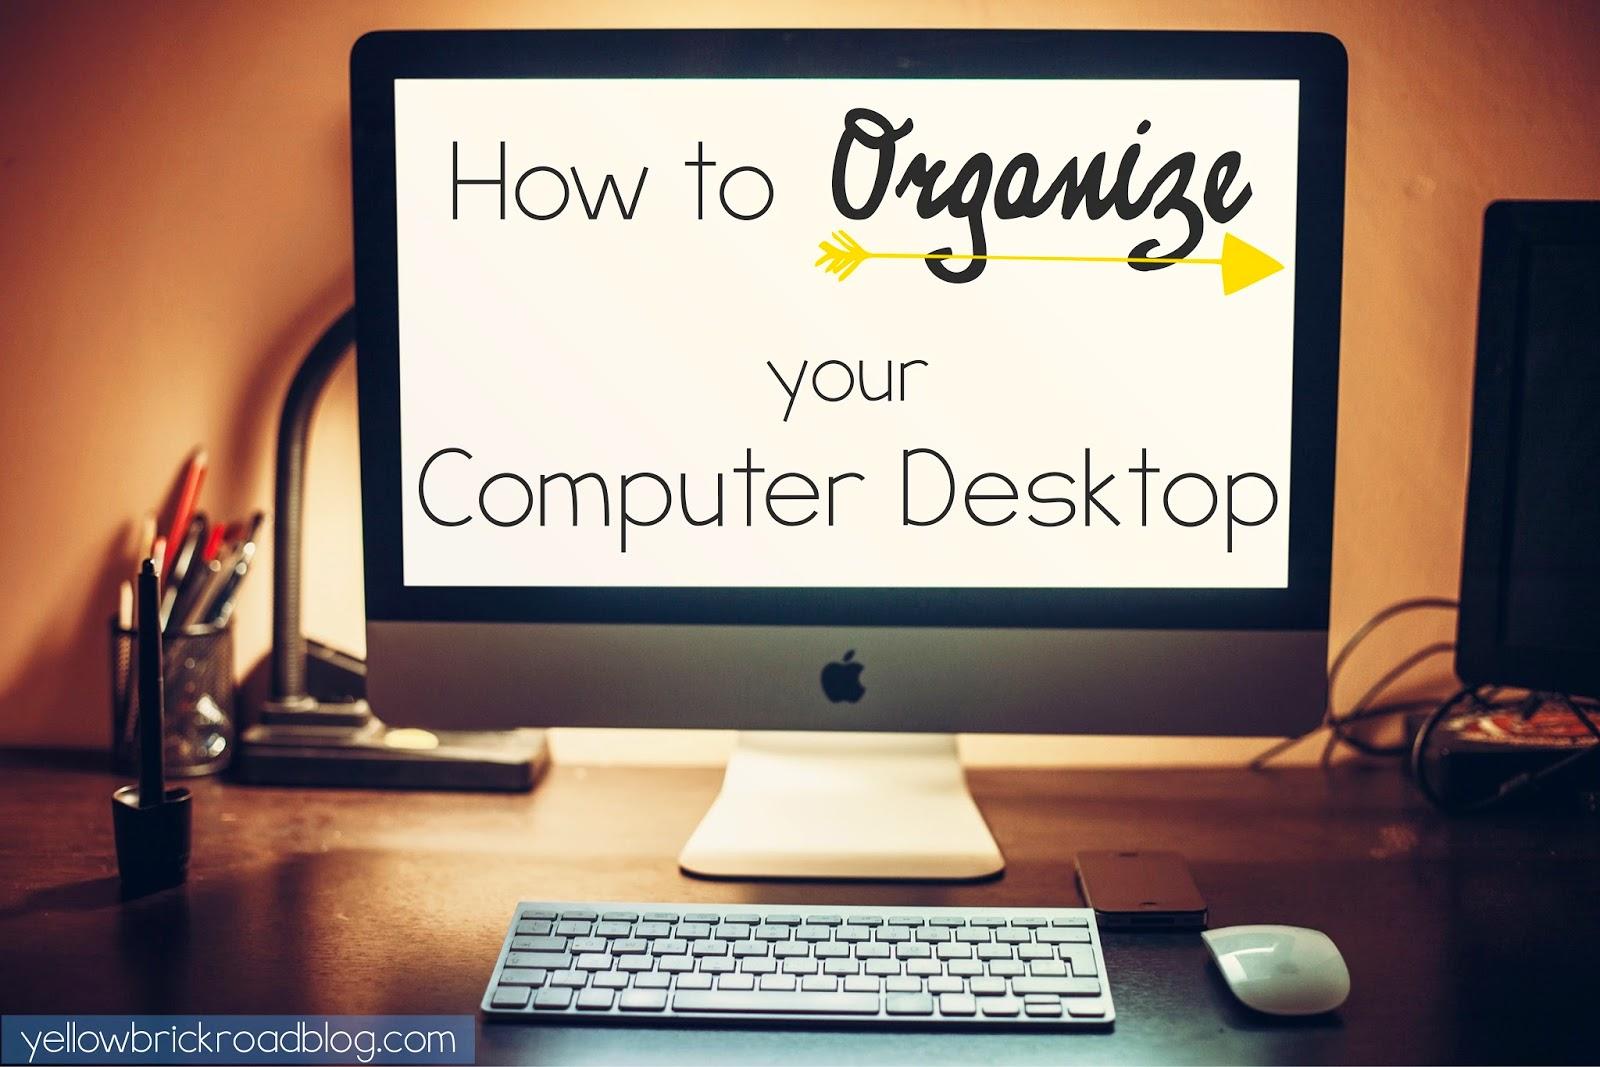 How to Organize Your Computer Desktop.